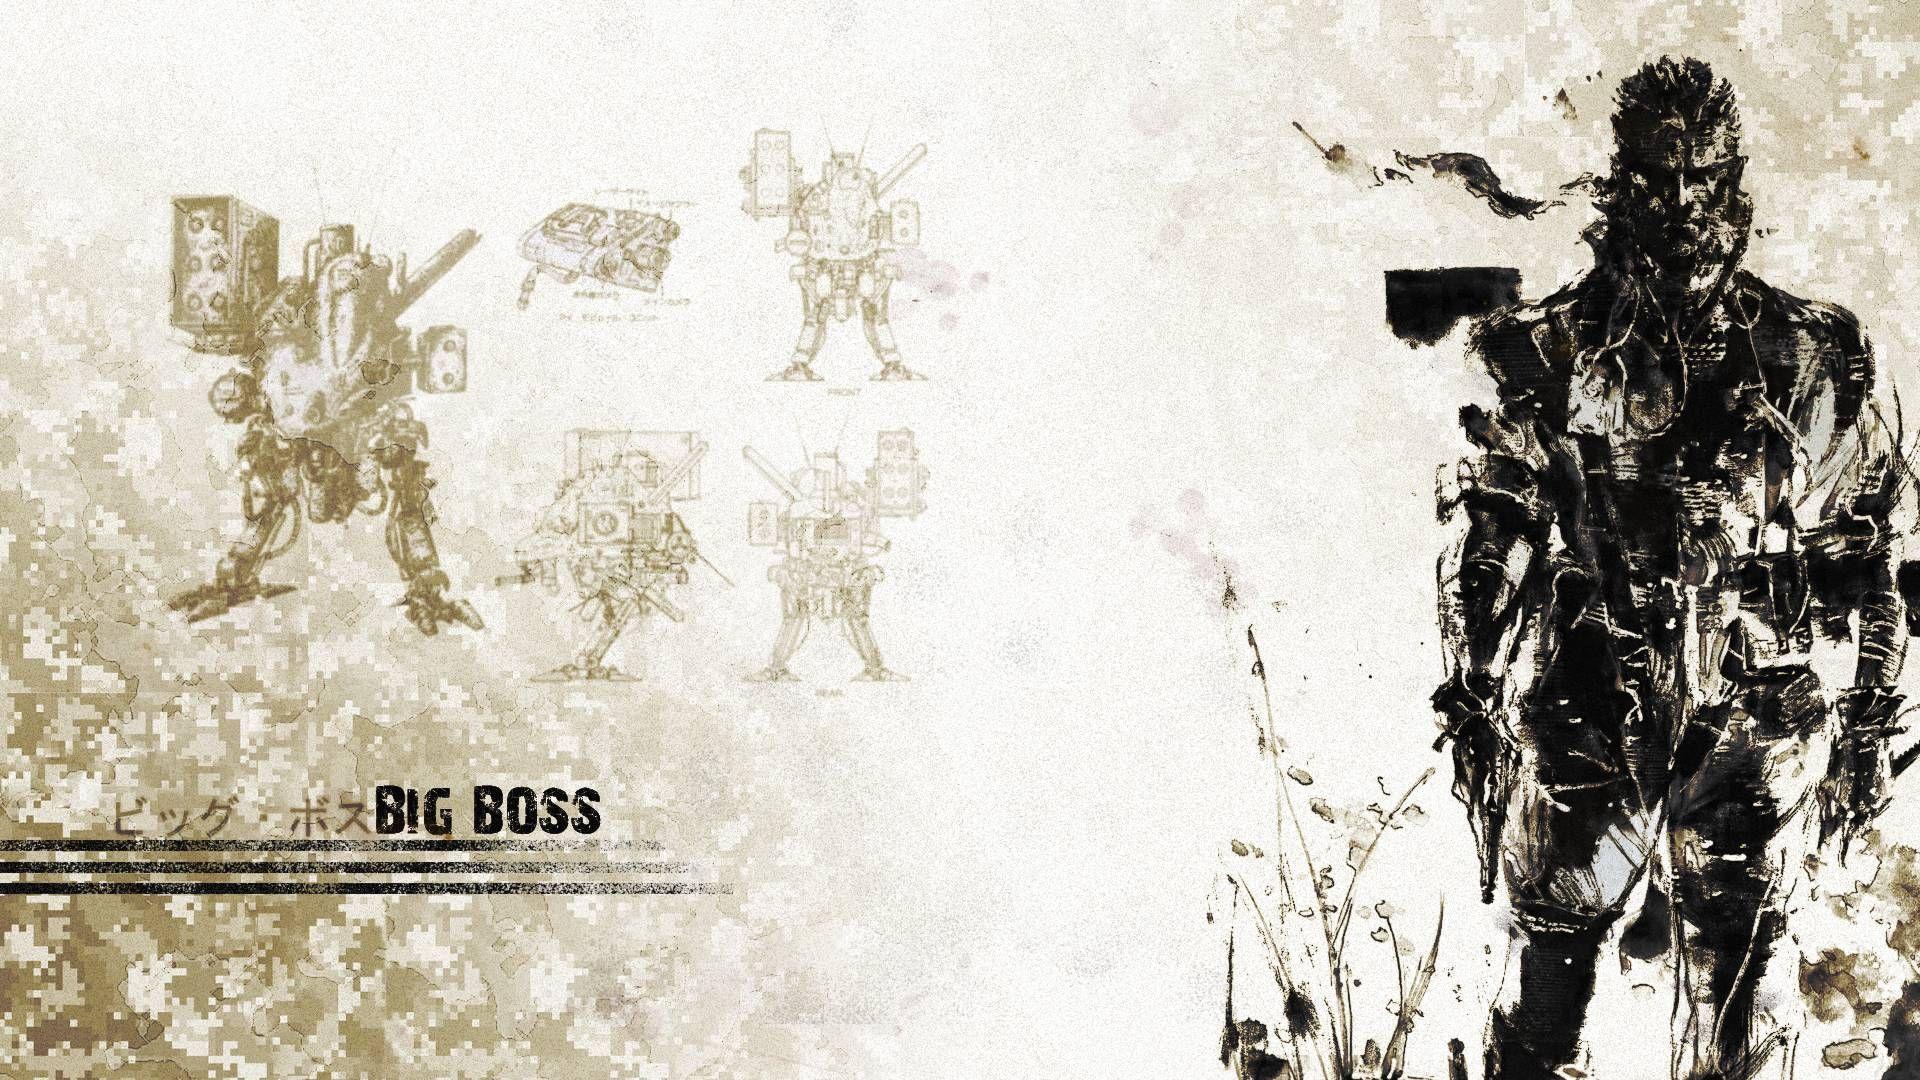 Lamborghini Wallpaper Beautiful Metal Gear Solid Snake